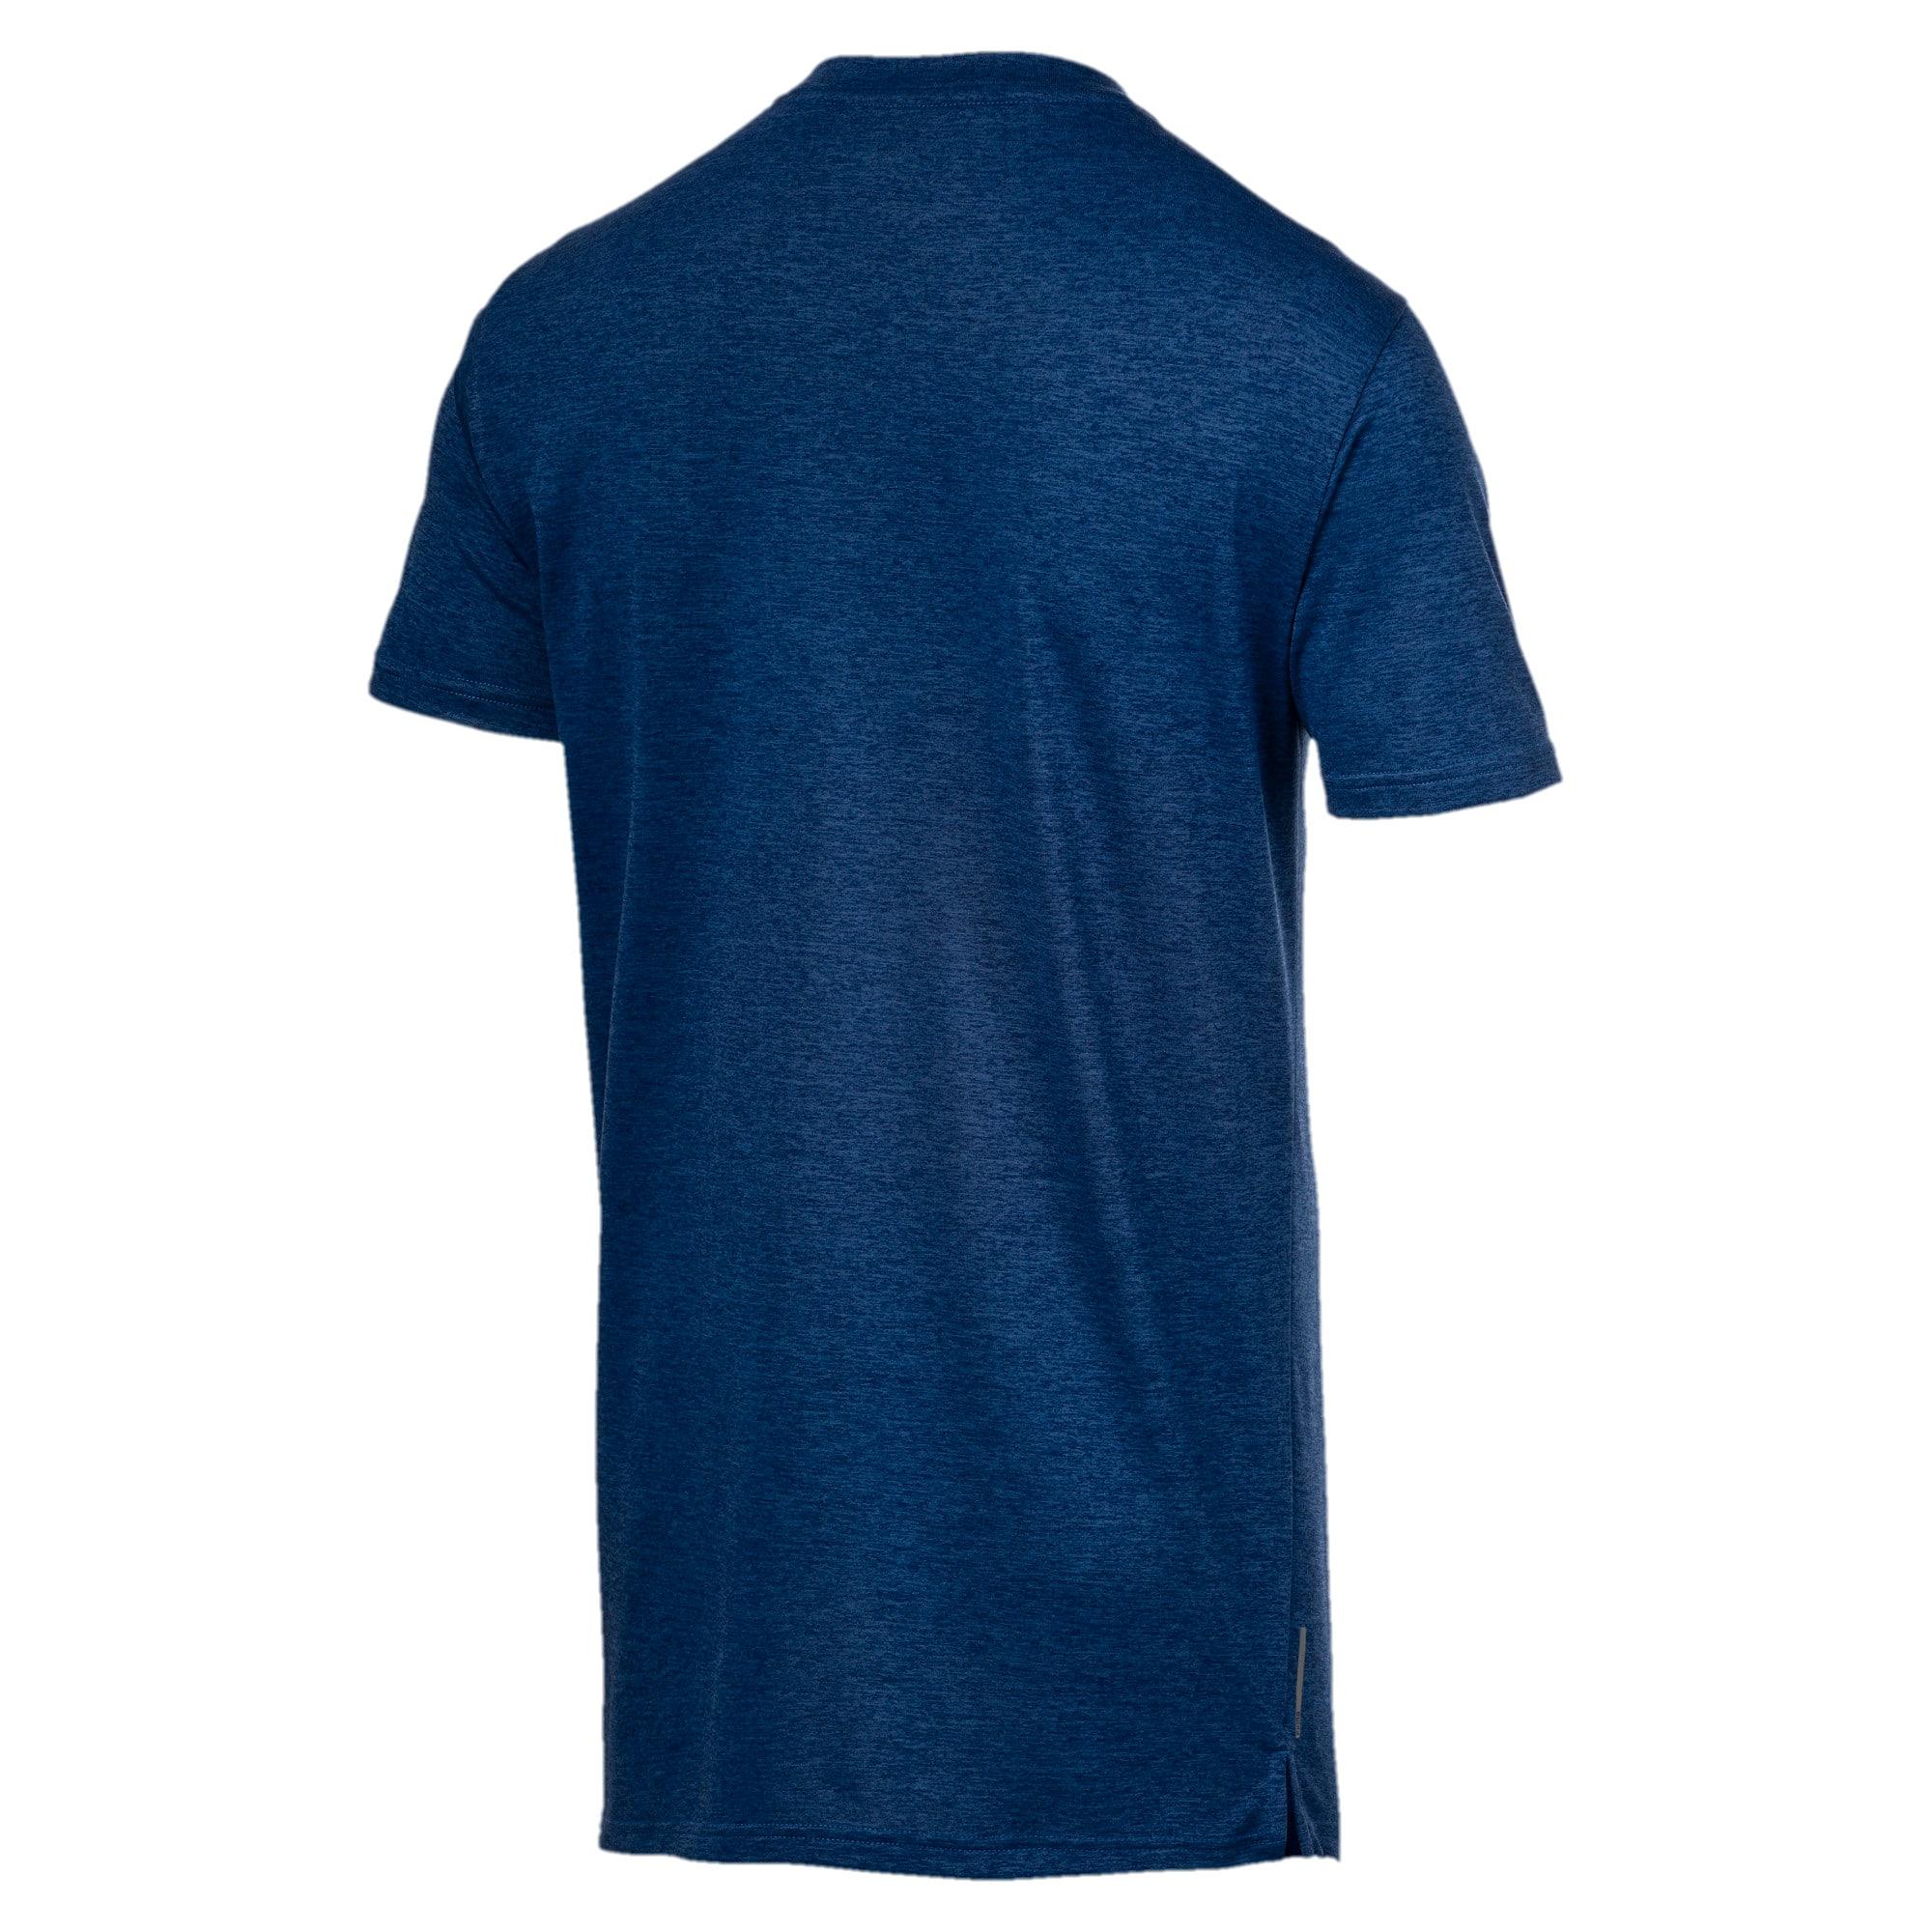 Thumbnail 5 of Heather Cat Herren Training T-Shirt, Galaxy Blue Heather, medium